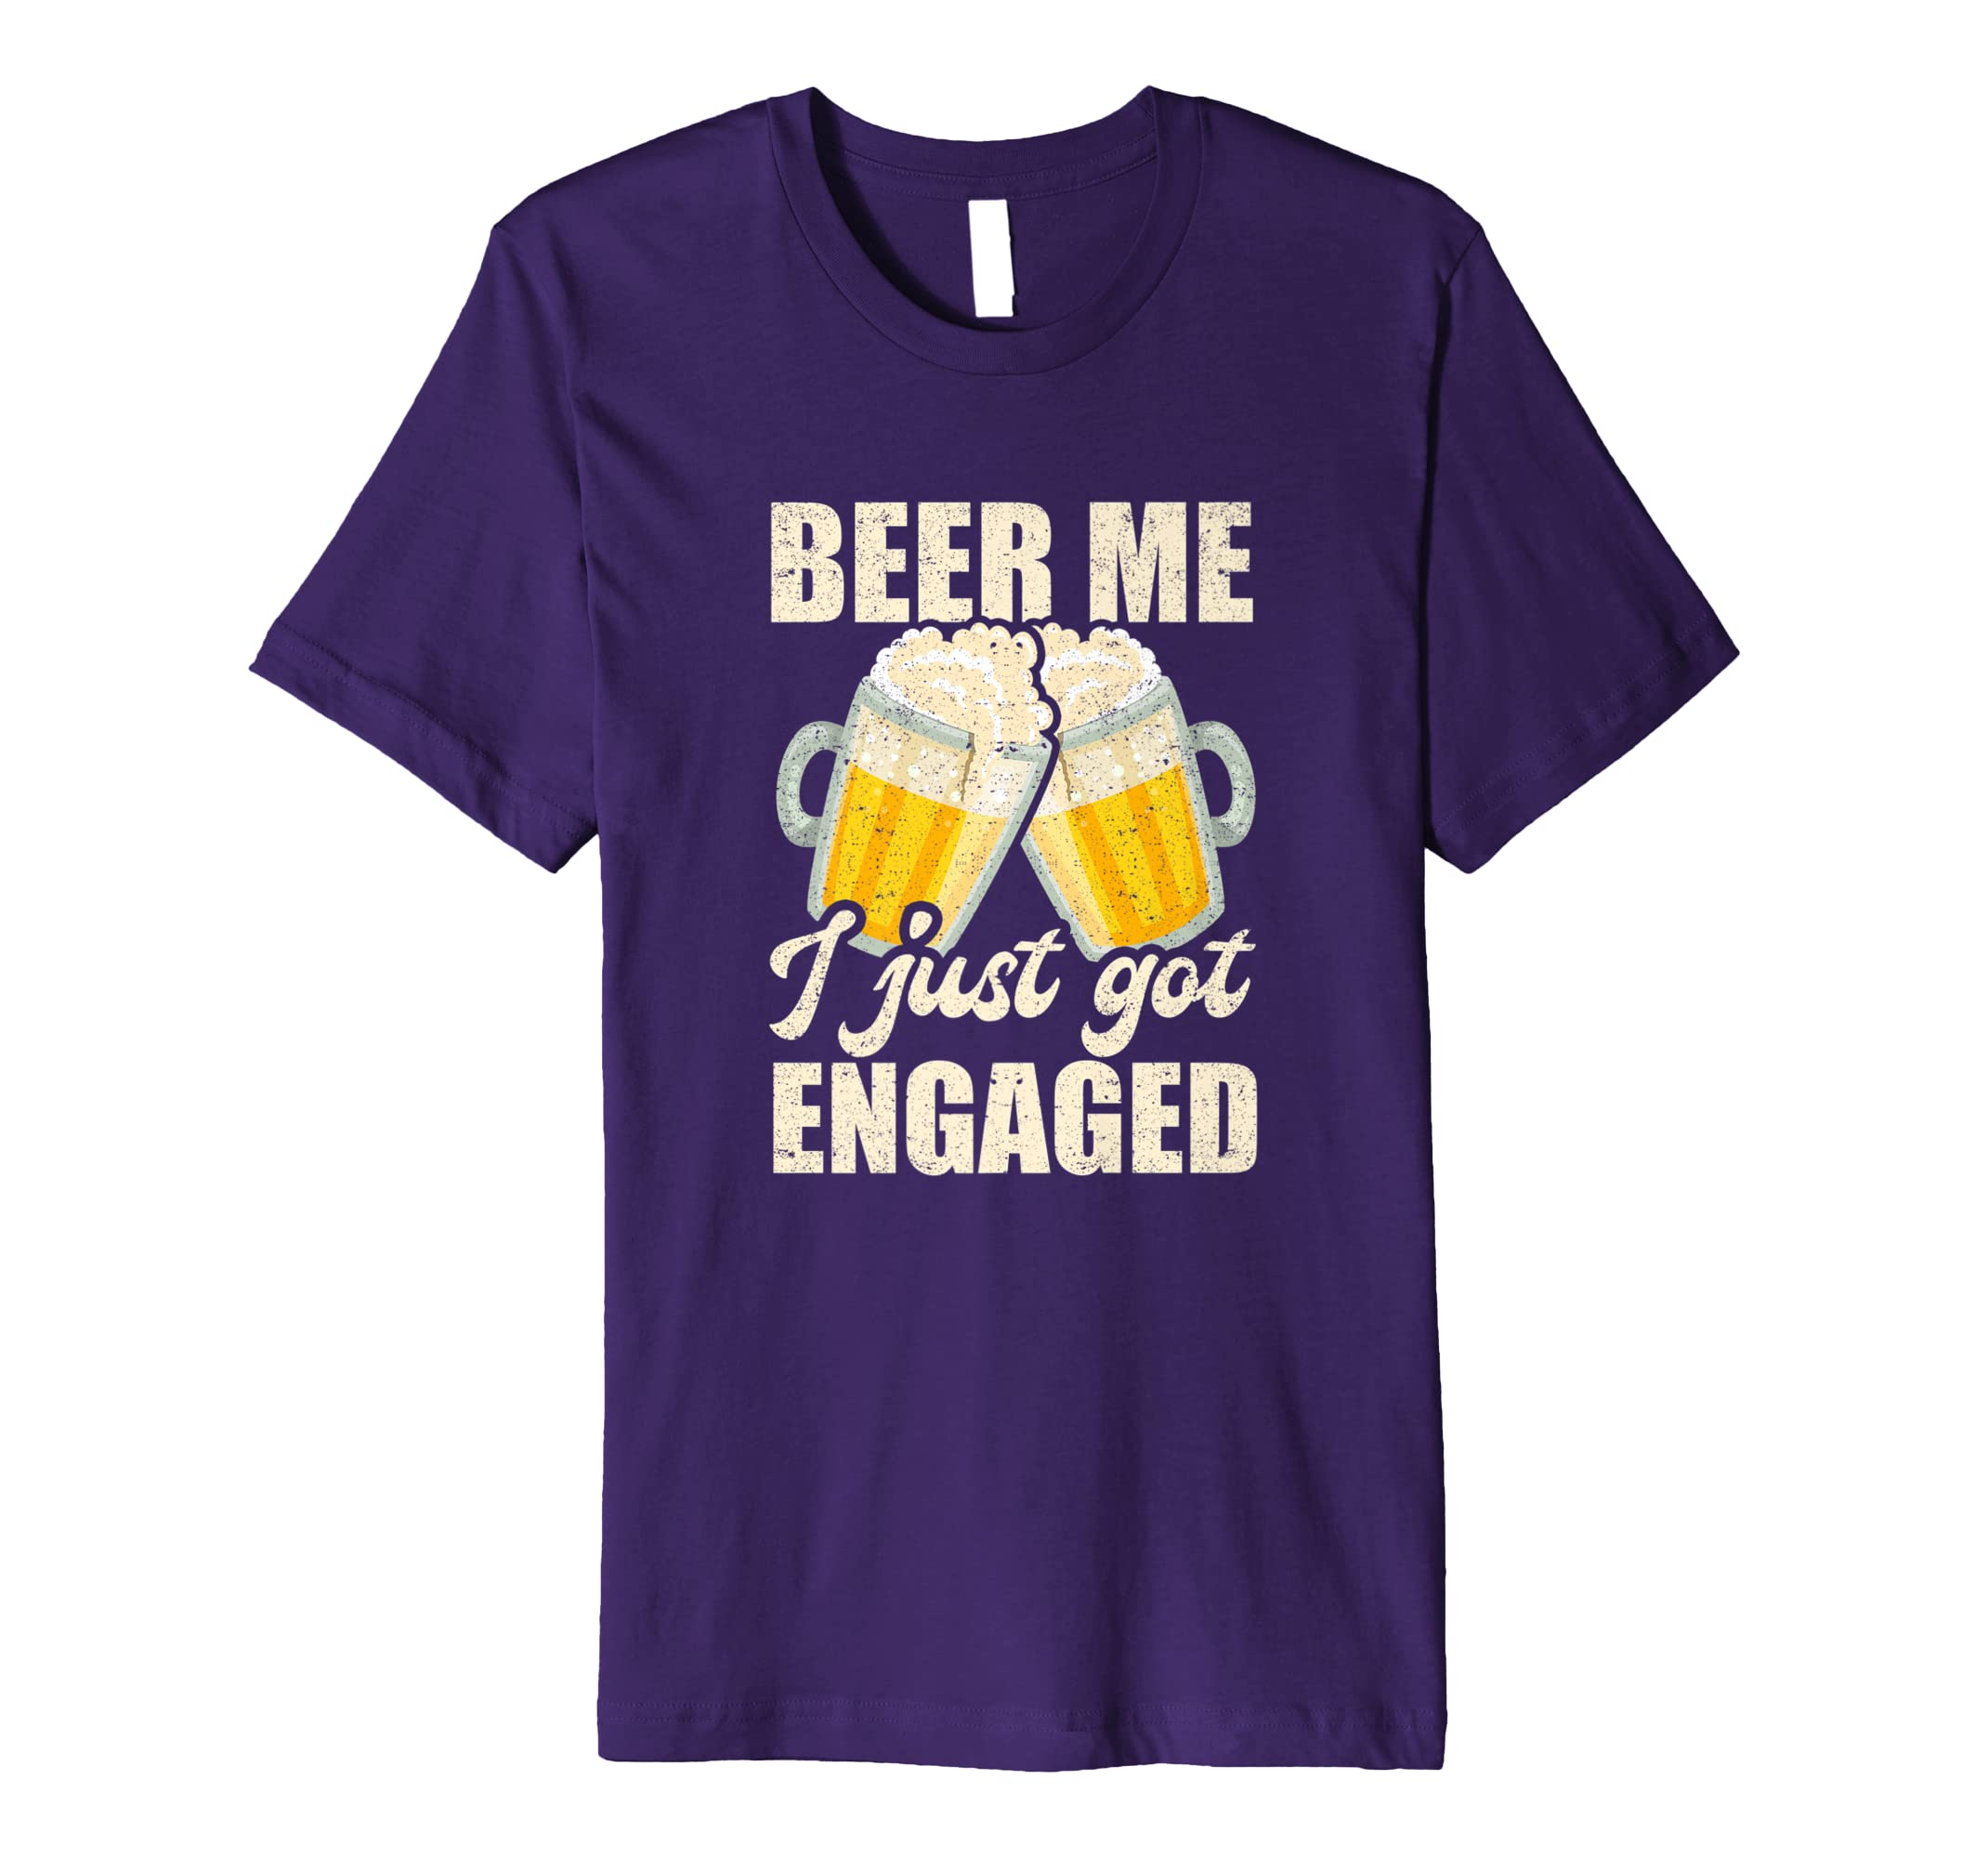 ffc8de5175 Amazon.com: Beer Me I Just Got Engaged Fiancee Couple Wedding Shirt:  Clothing